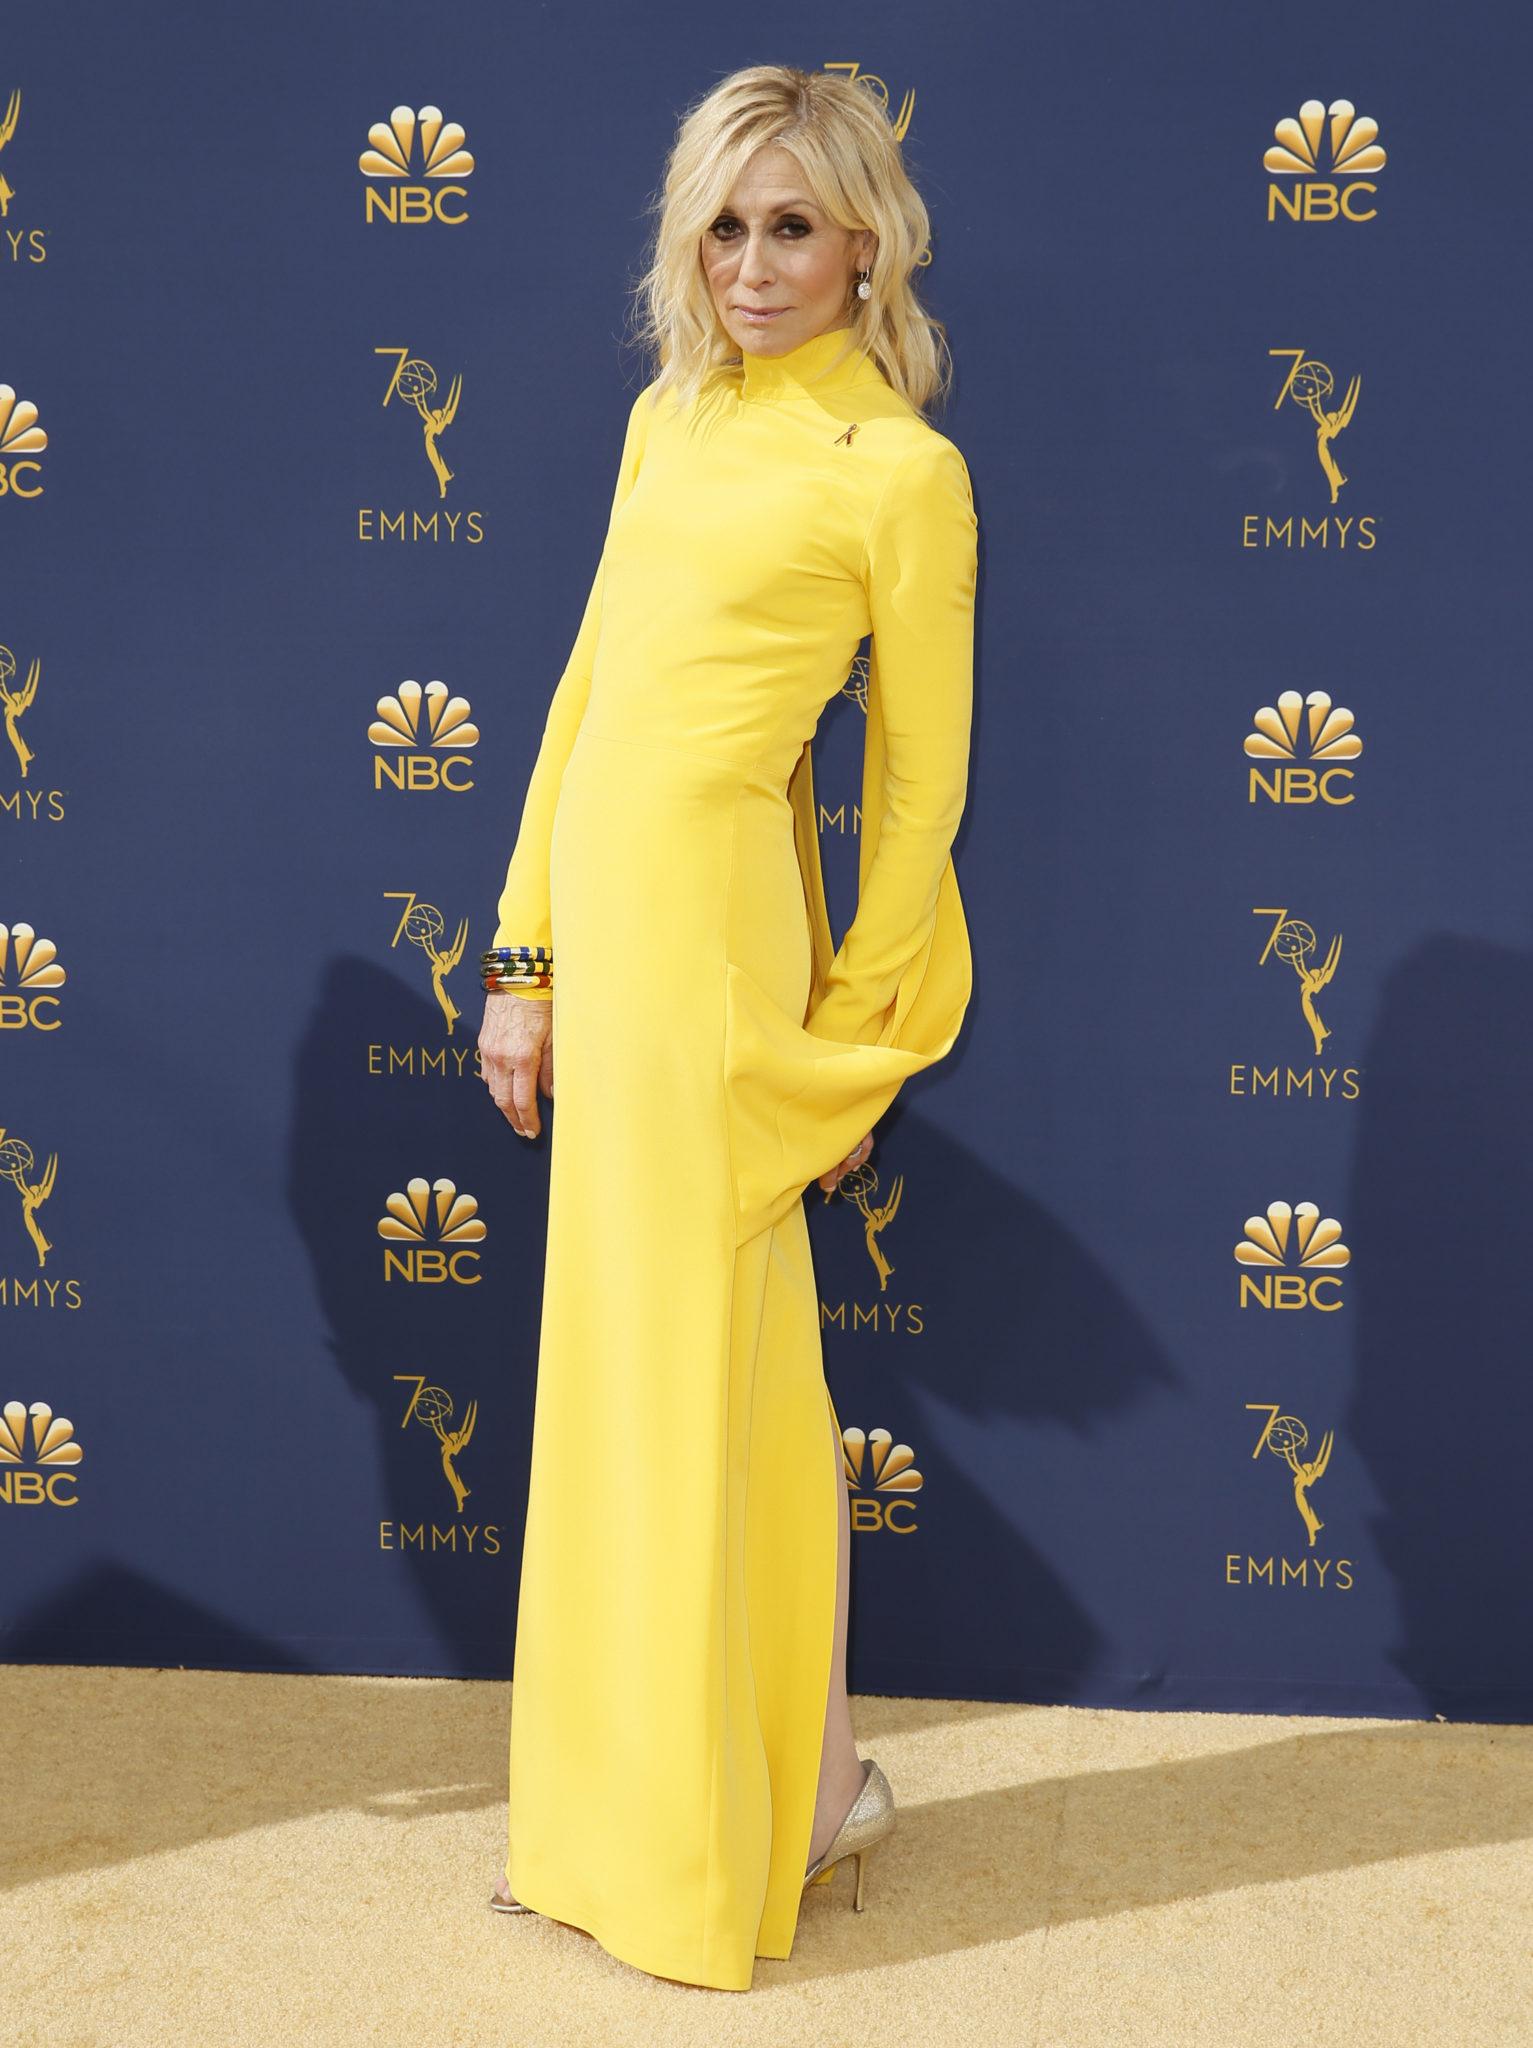 Judith Light Emmys 4Chion Lifestyle